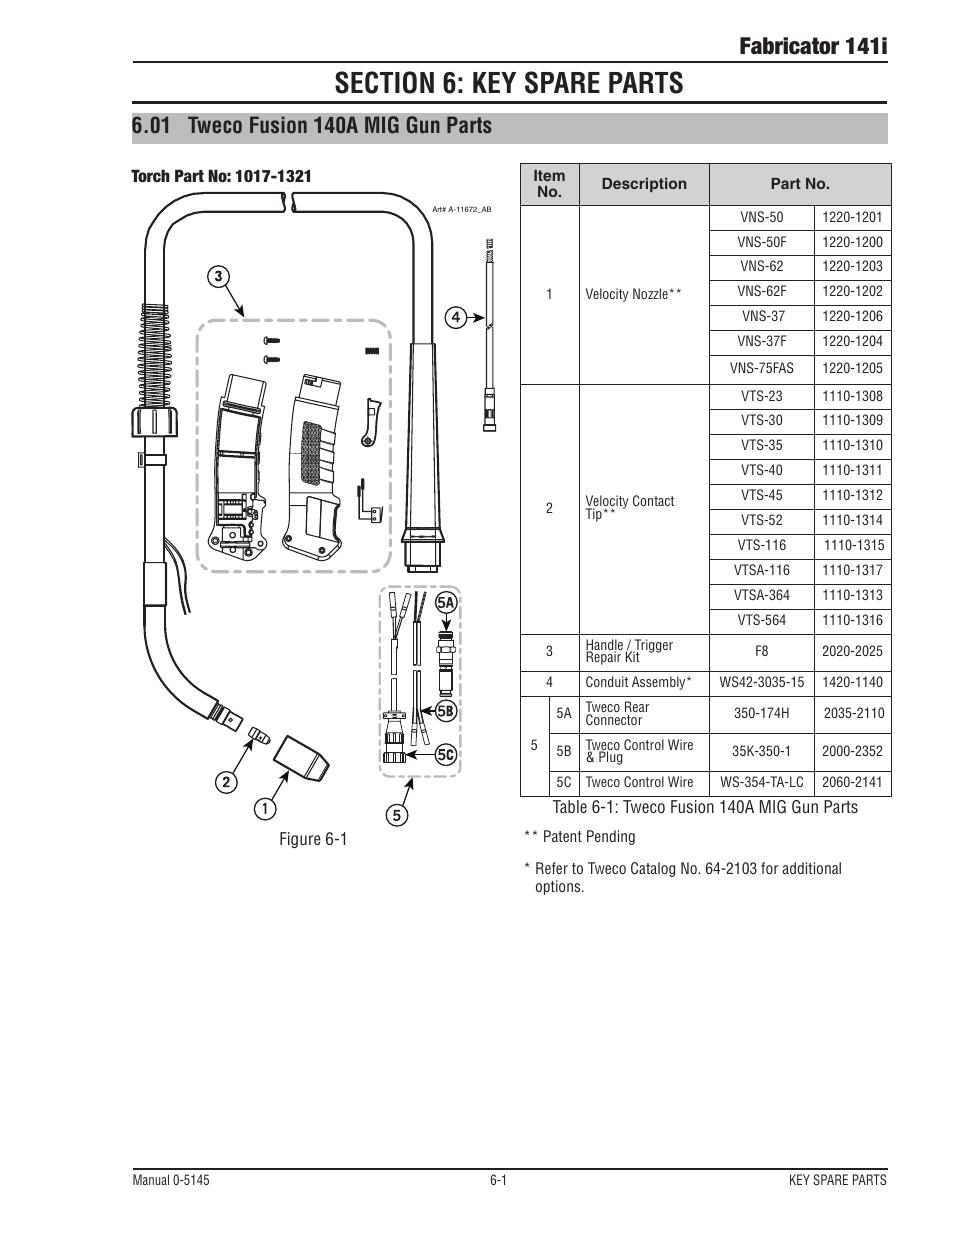 Section 6: key spare parts, 01 tweco fusion 140a mig gun